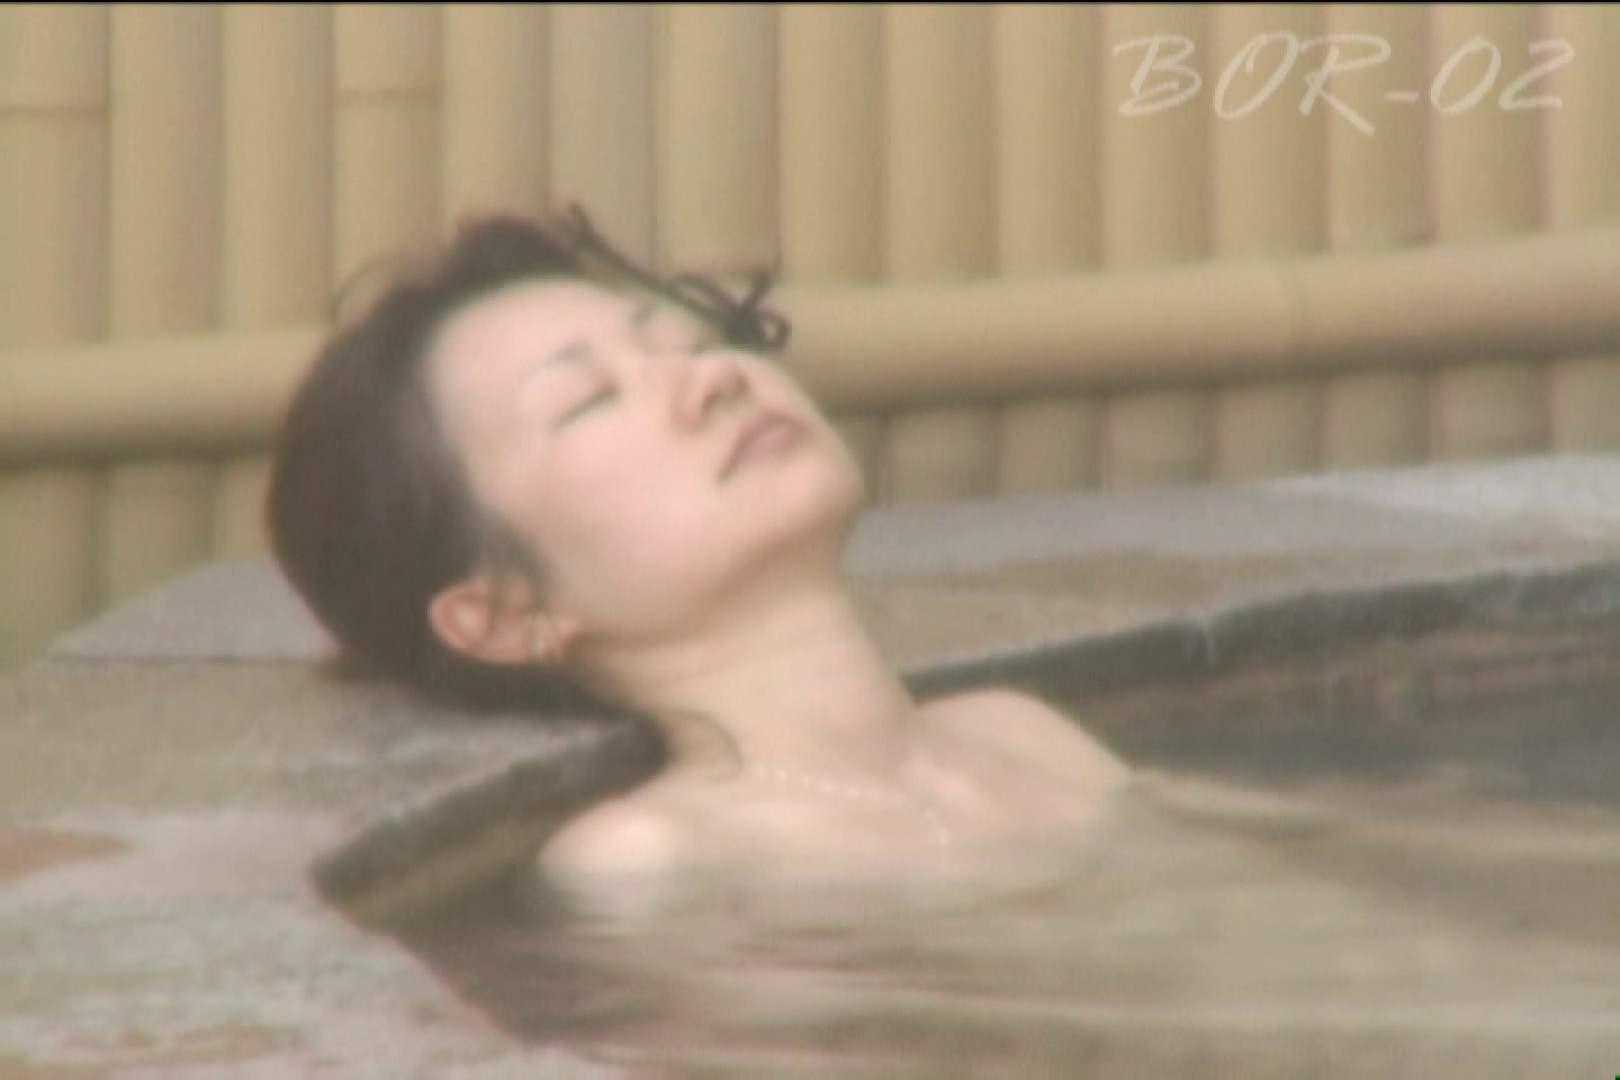 Aquaな露天風呂Vol.477 盗撮   OLエロ画像  99PICs 52